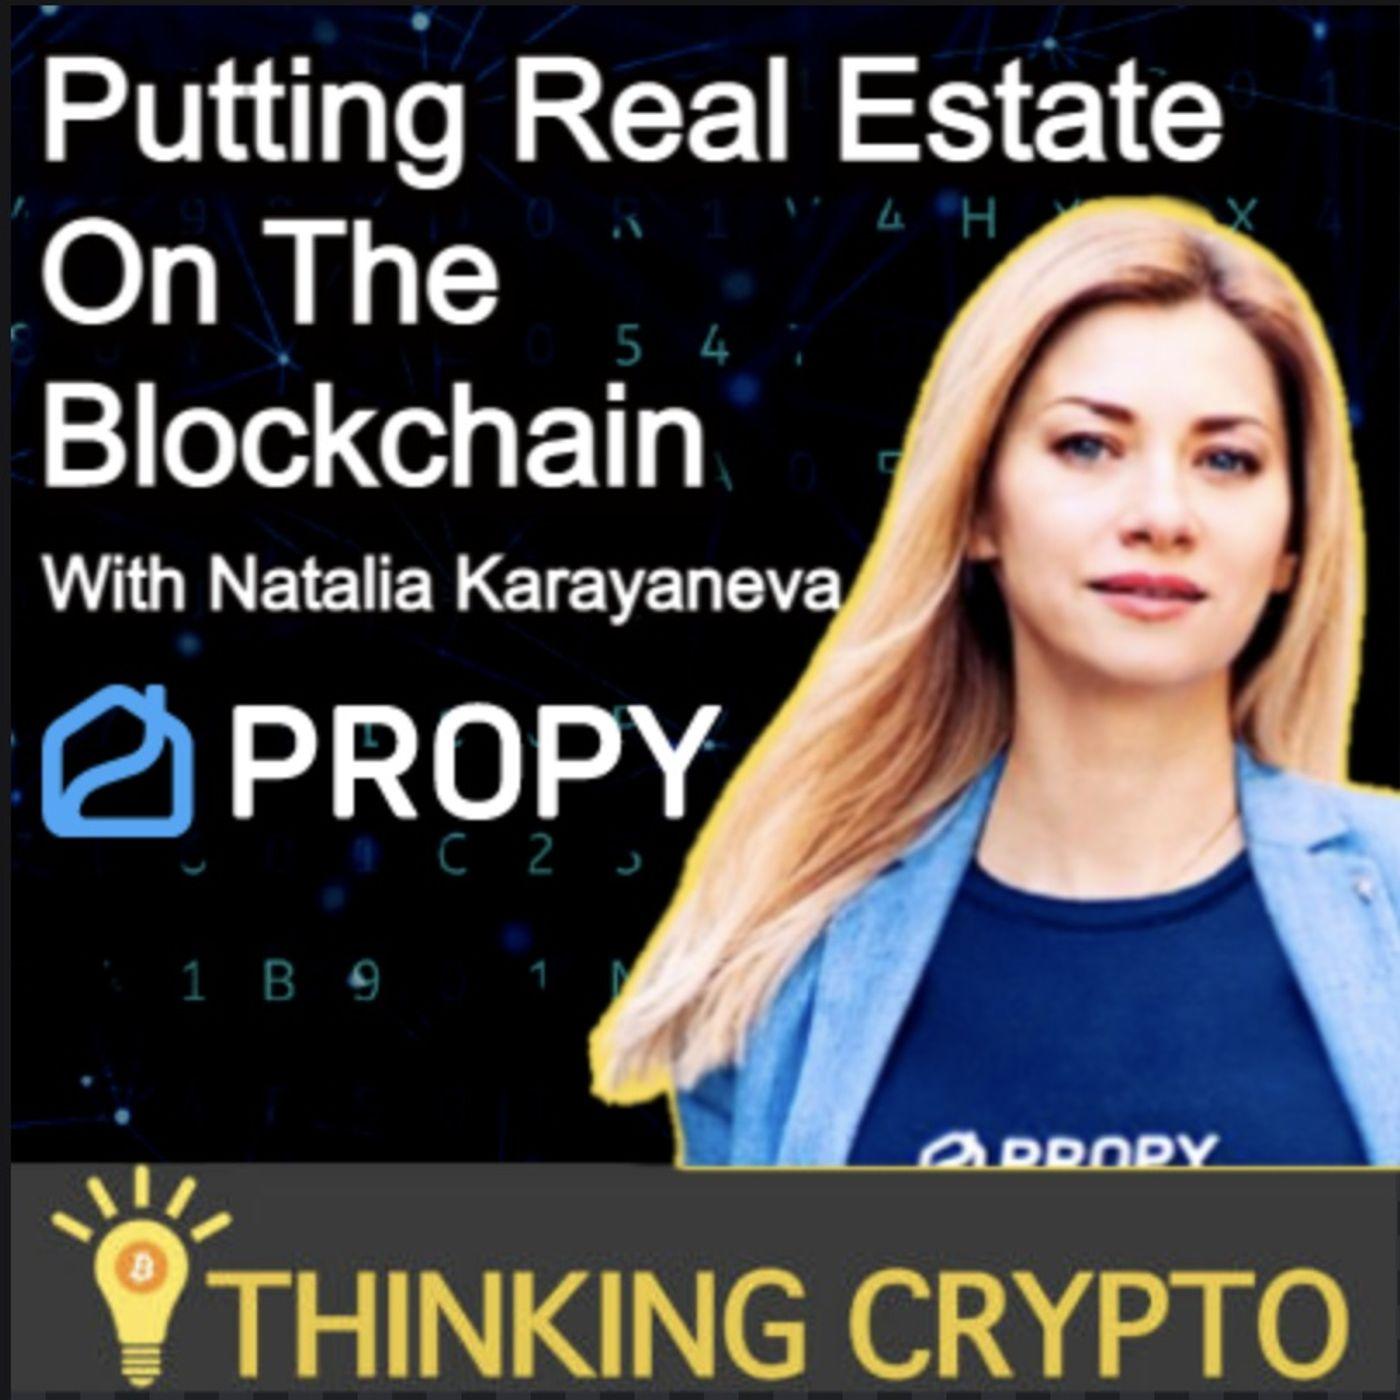 Natalia Karayaneva CEO of Propy Interview - Real Estate on the Blockchain, XRP, Bitcoin, NFTs, CBDCs